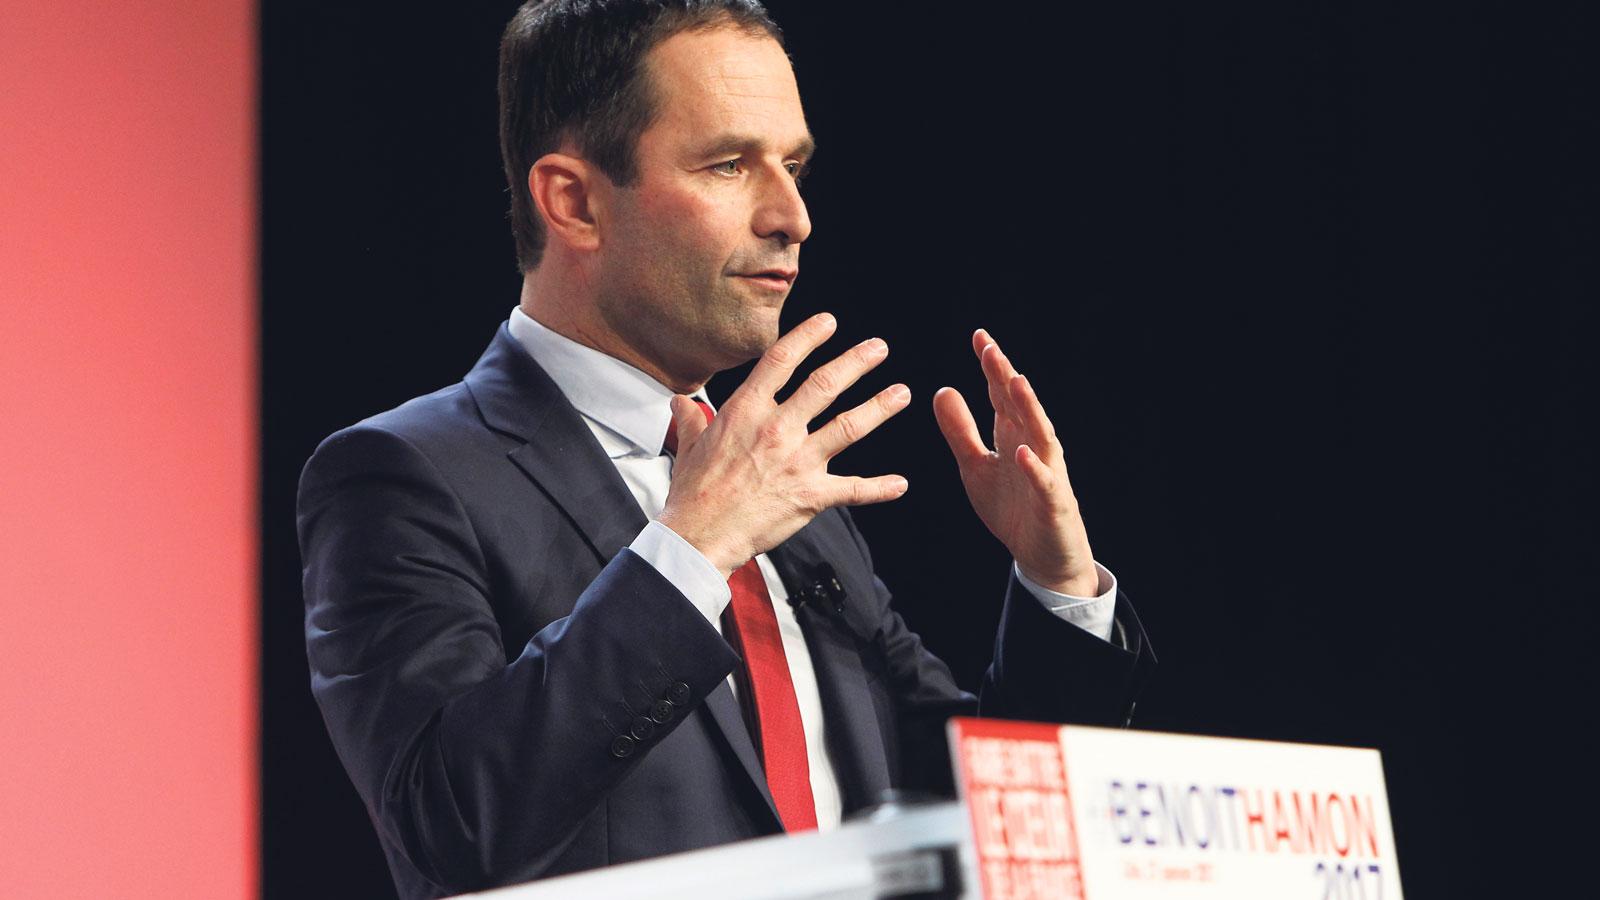 odds franska valet